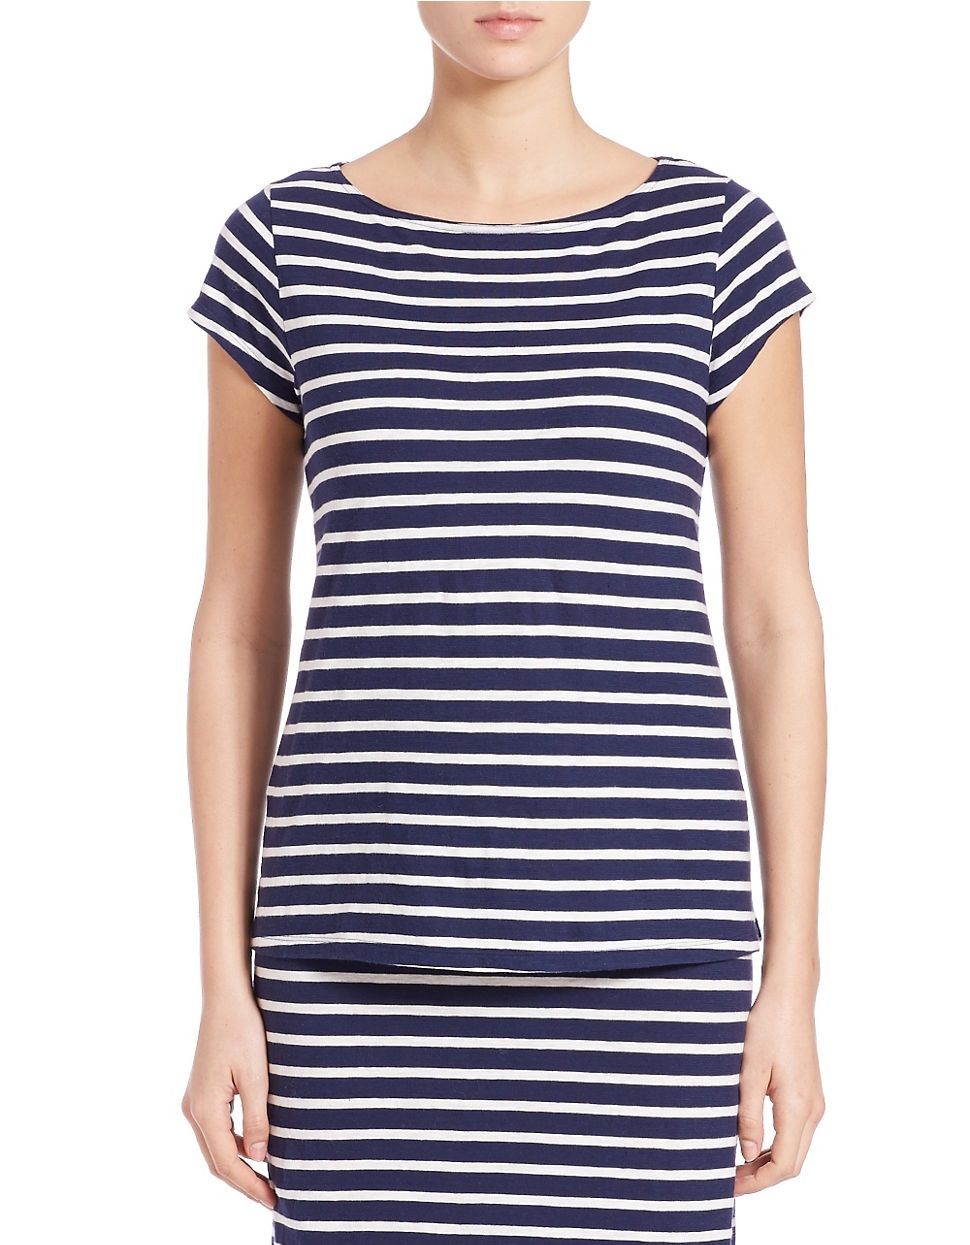 Lyst eileen fisher petite striped organic cotton tee in blue for Eileen fisher organic cotton t shirt